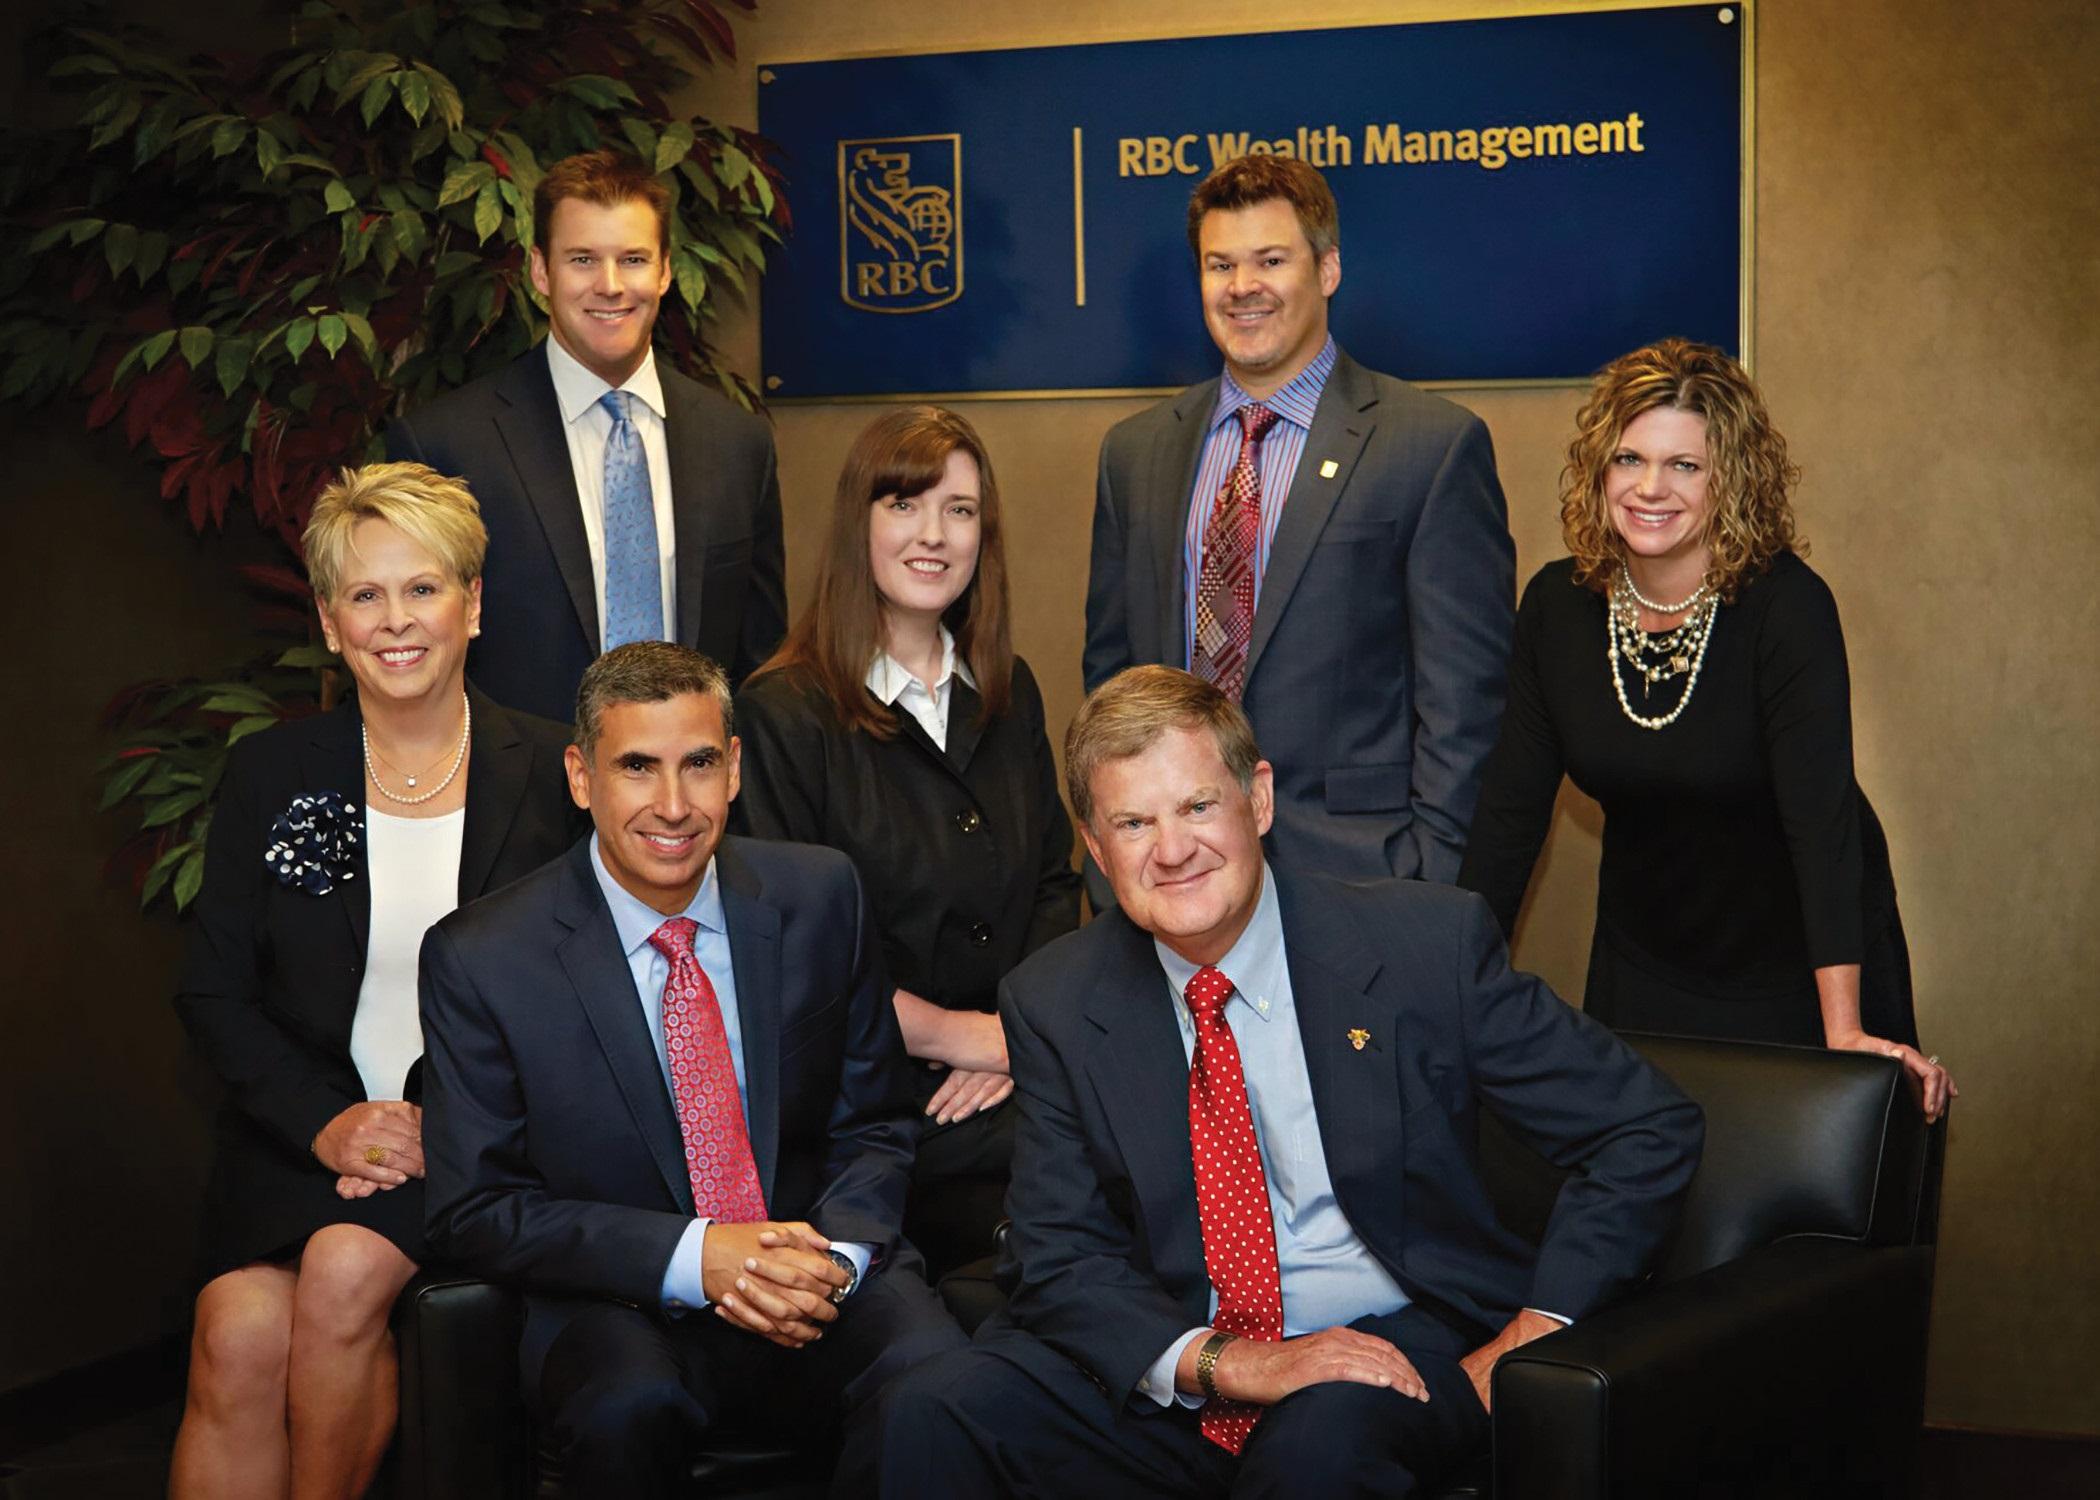 RBC Wealth Management-USA Picture